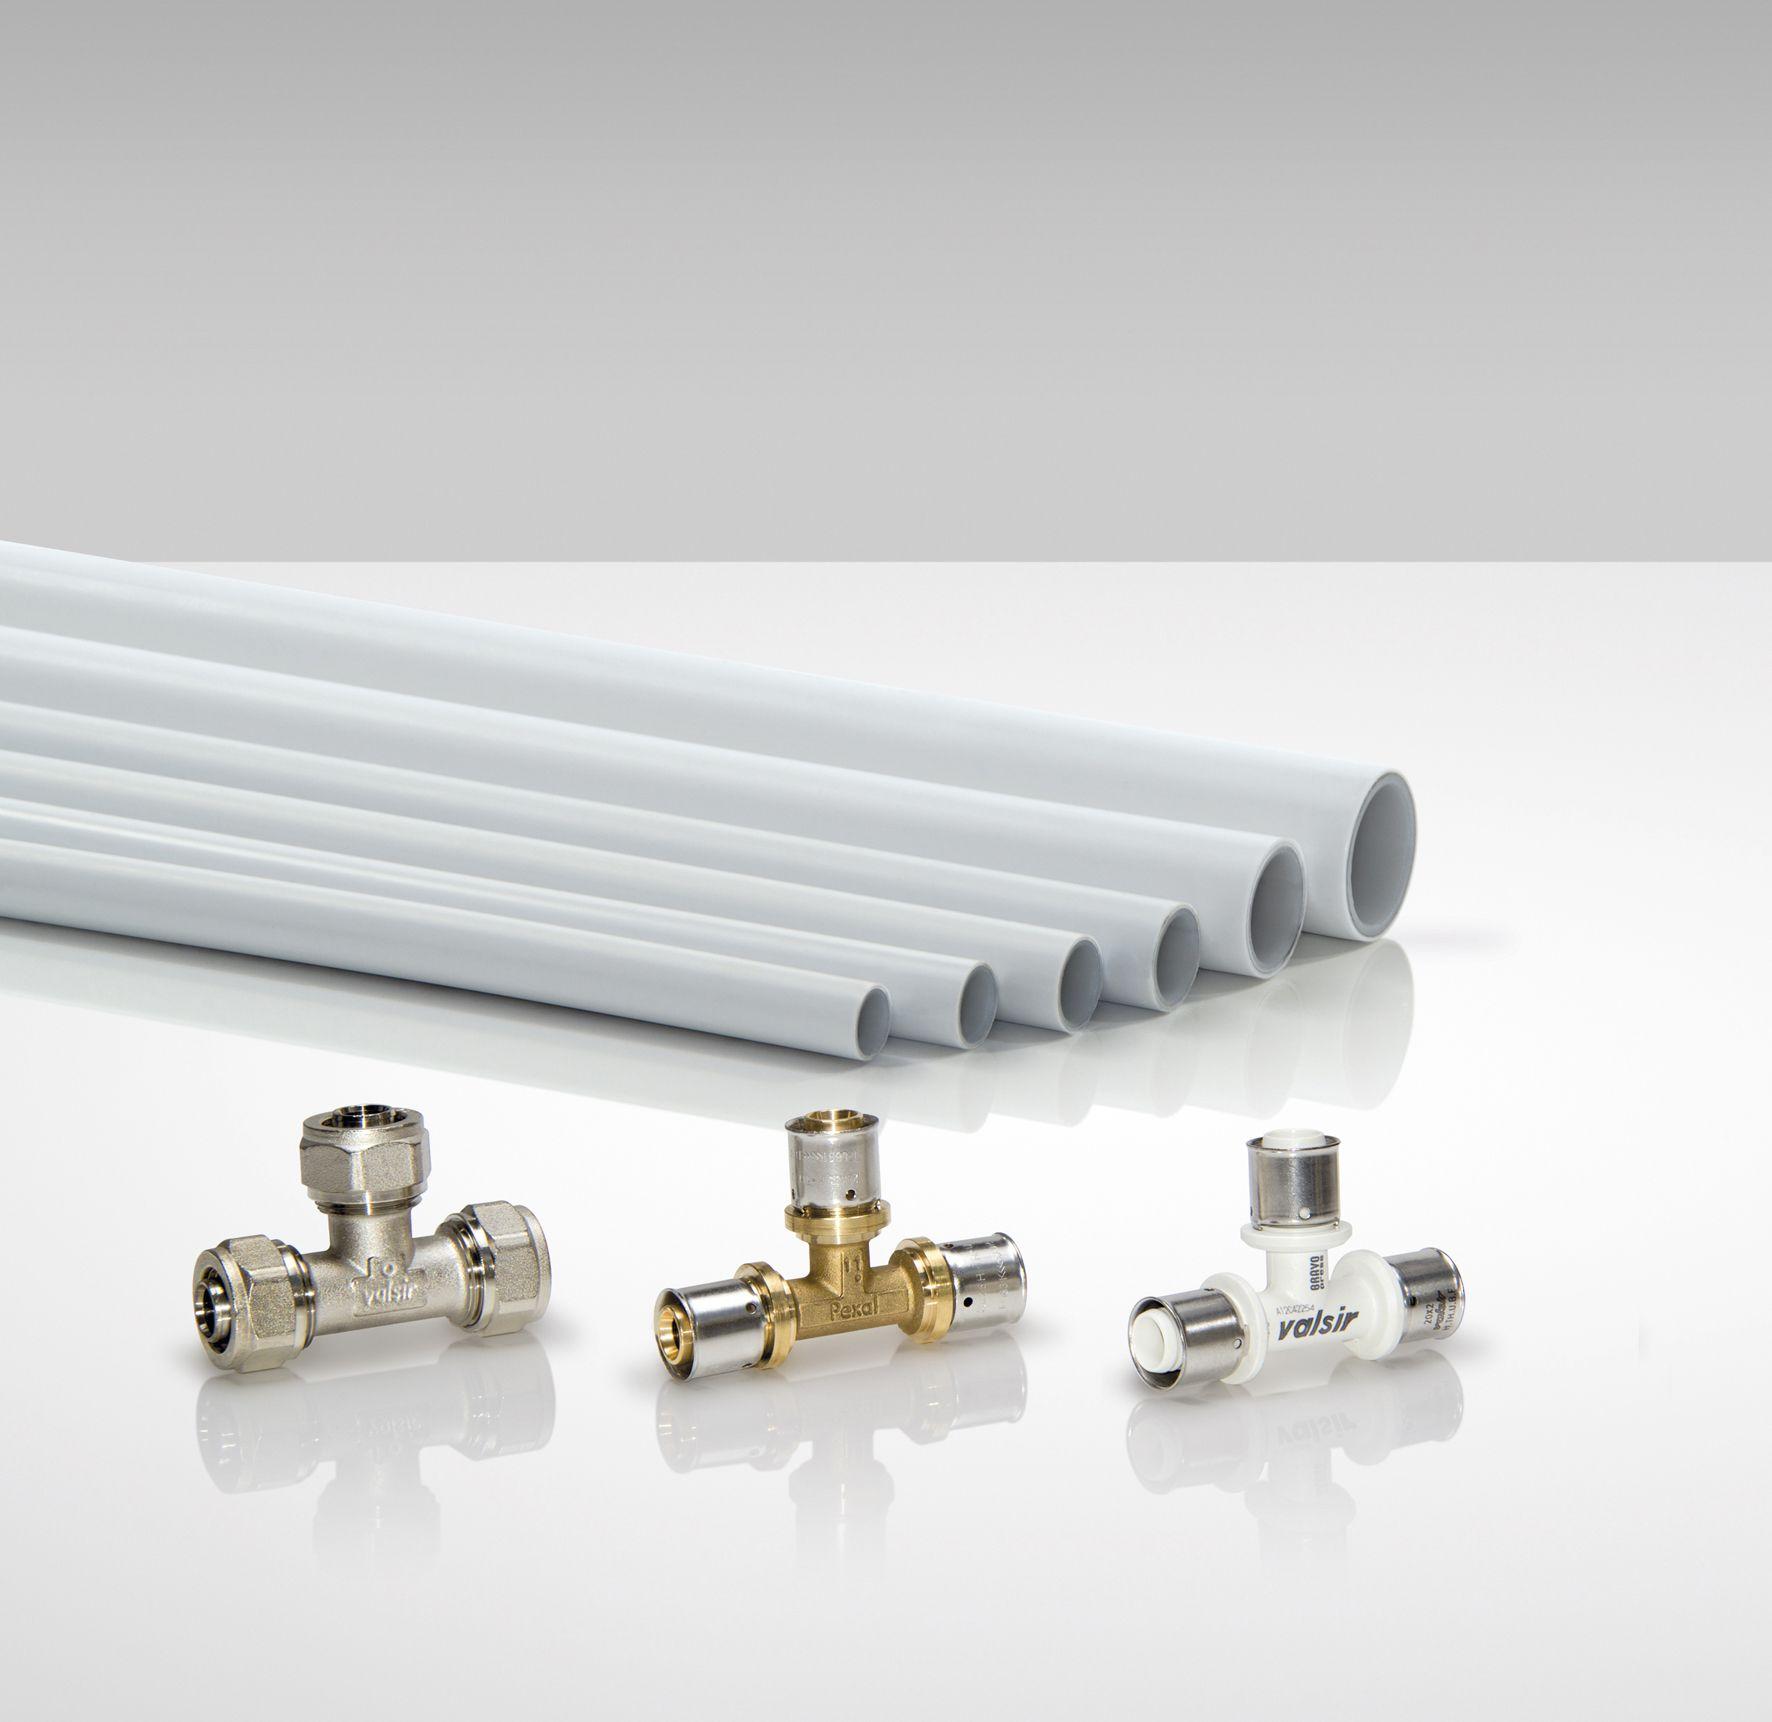 Pin On Valsir Mixal Piping System Sistemi Di Adduzione